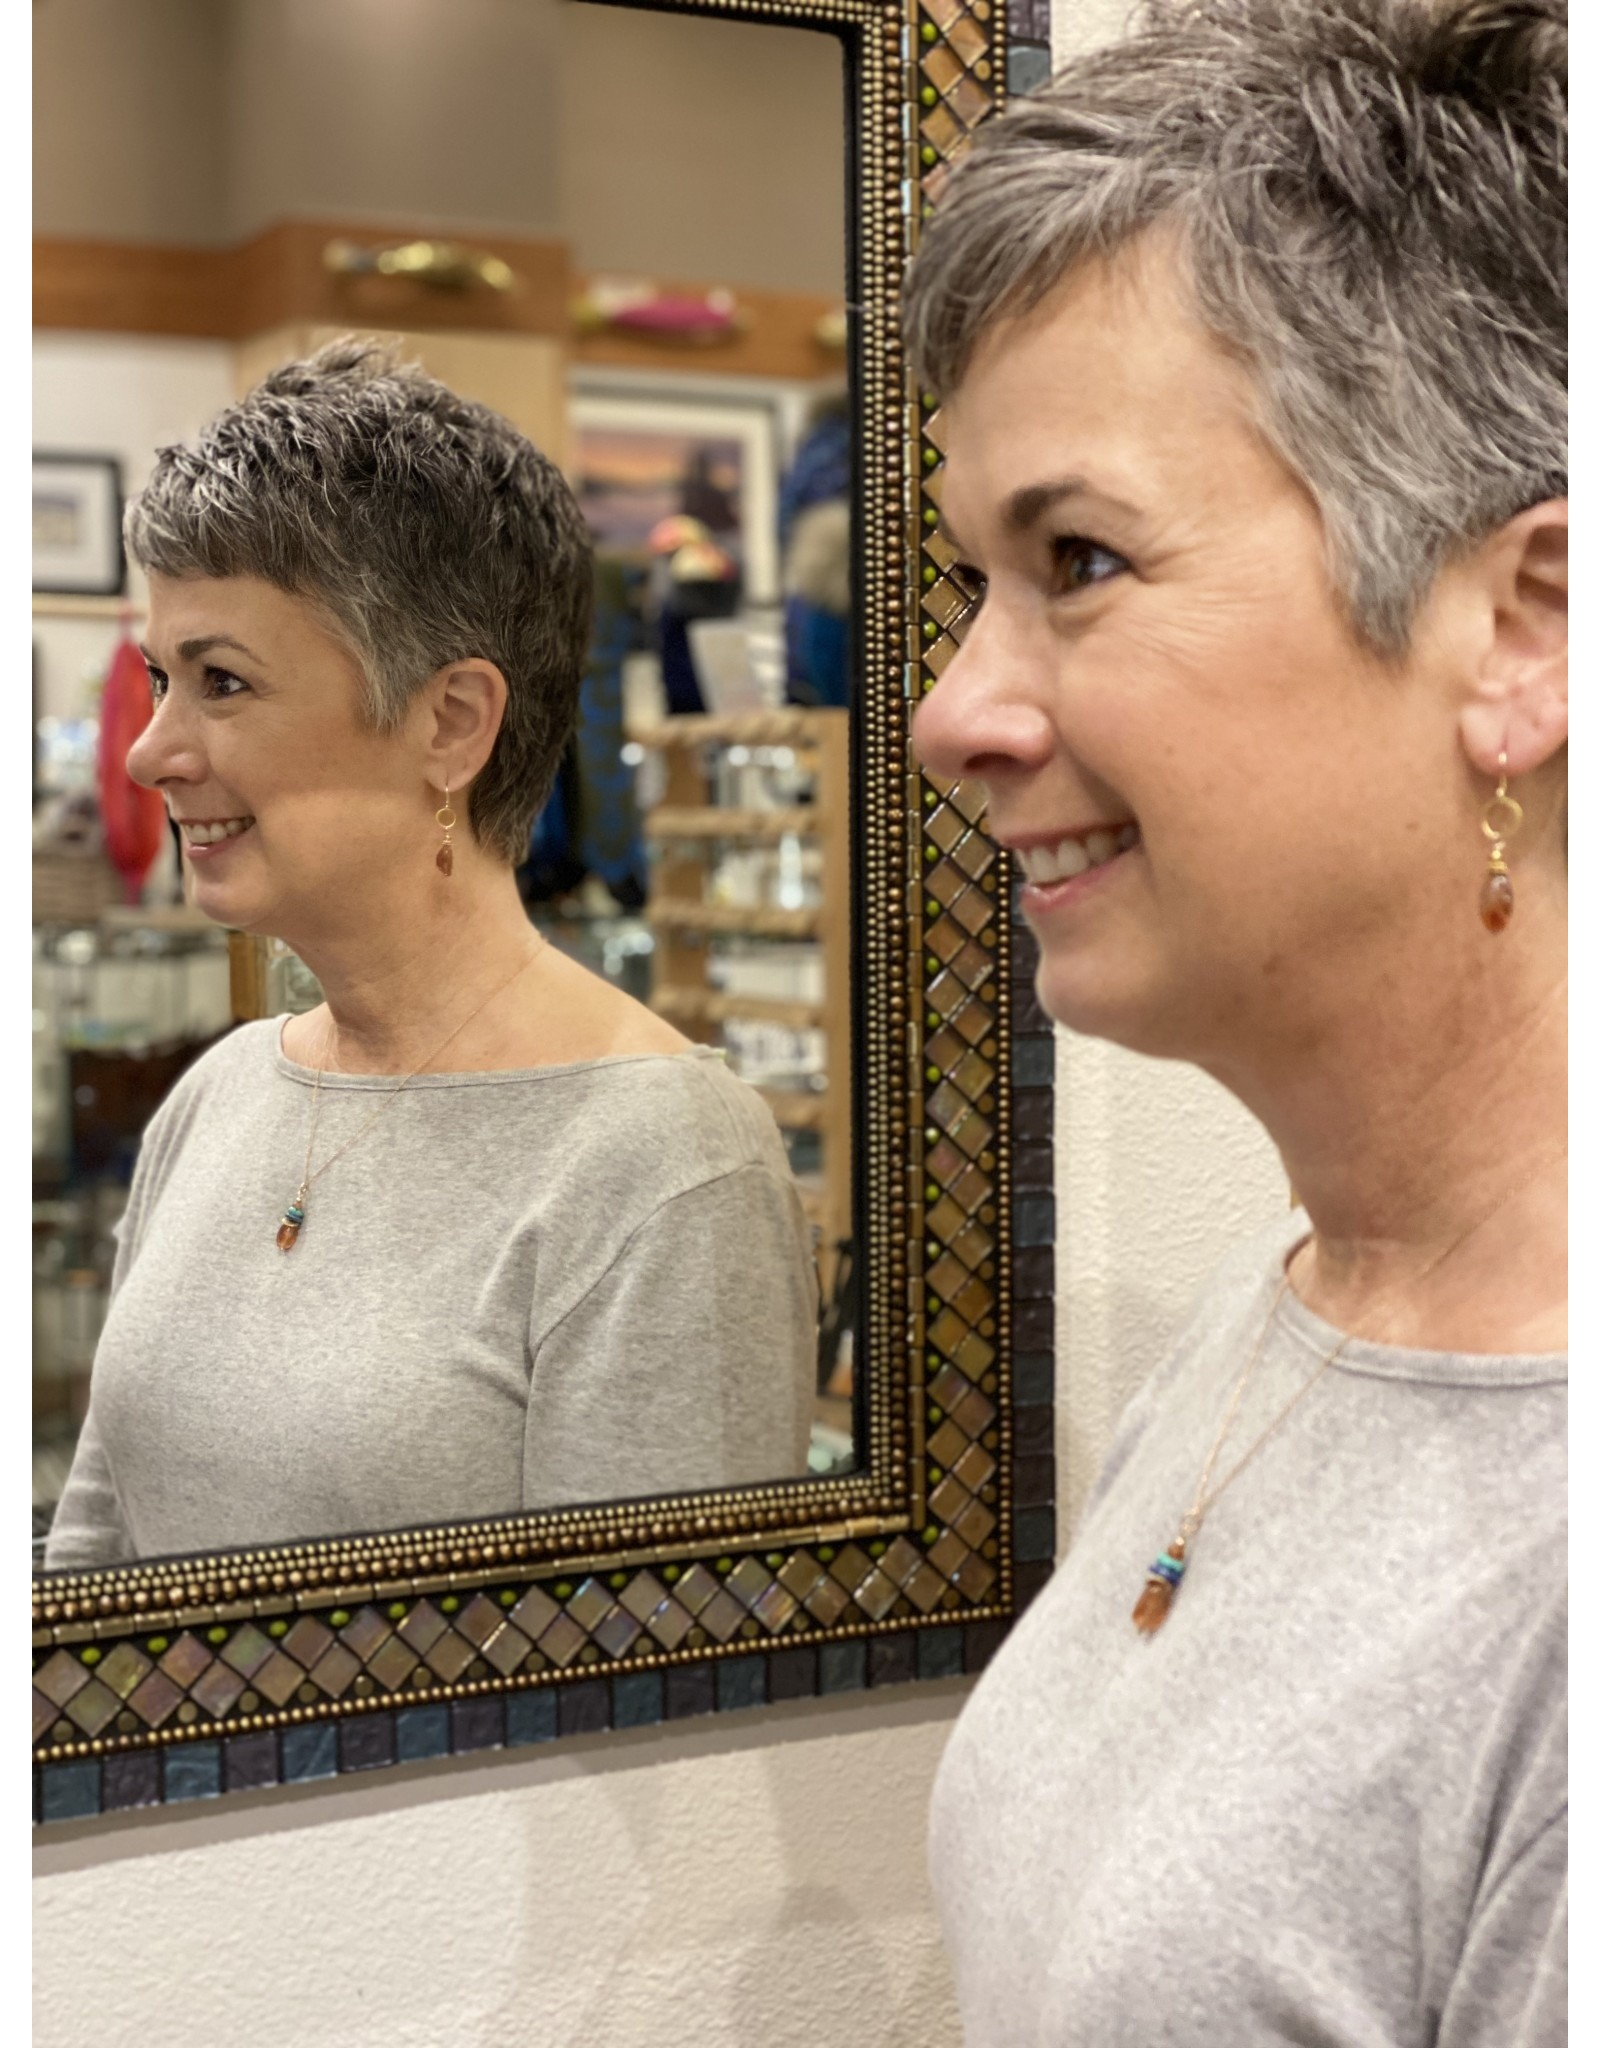 Moondance Alaska by Colleen Goldrich Moondance Earrings Glorious Sunstone, 14k gold-fill